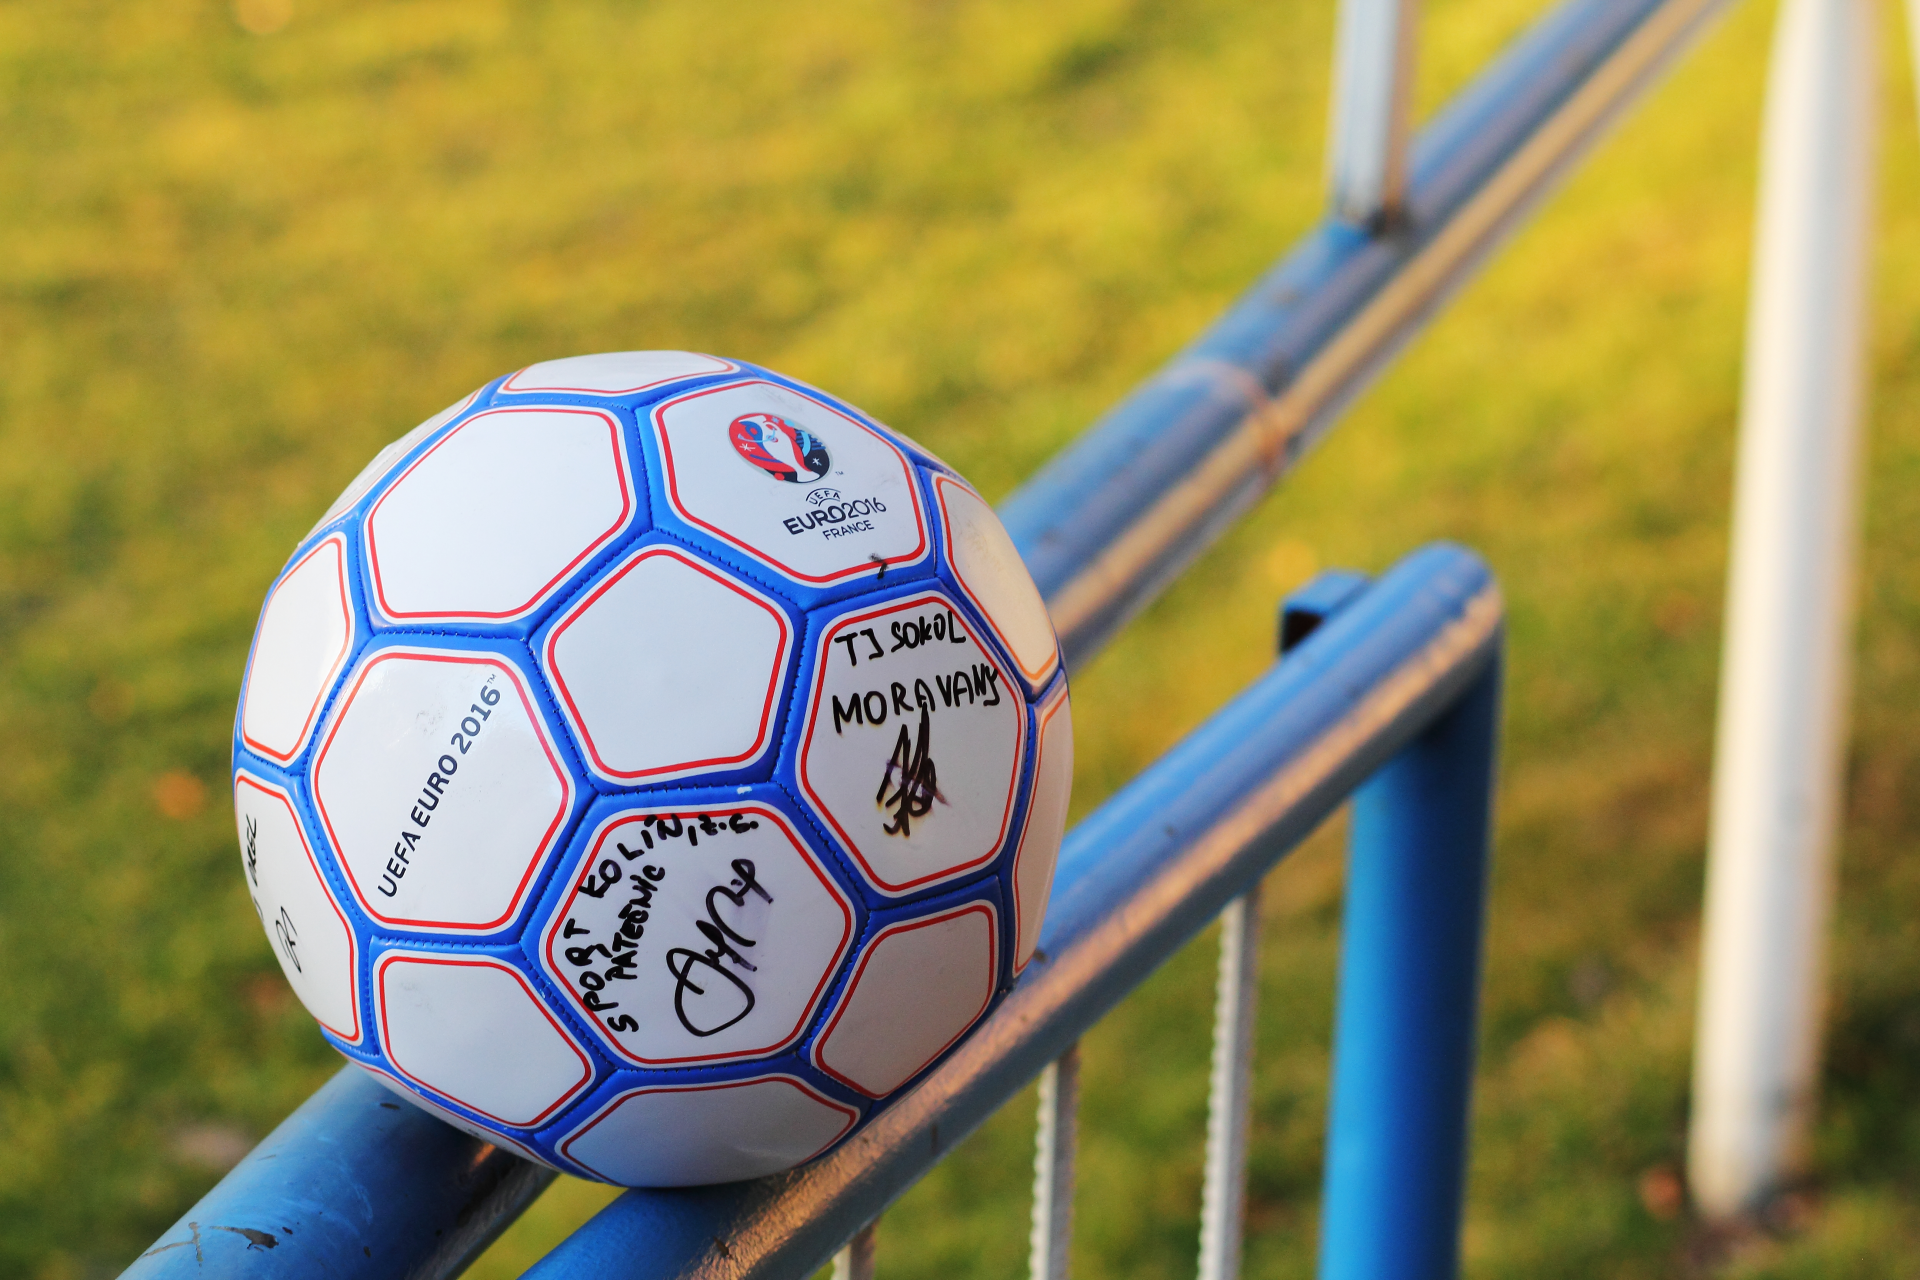 Foto TJ Sokol Moravany fotbalový míč